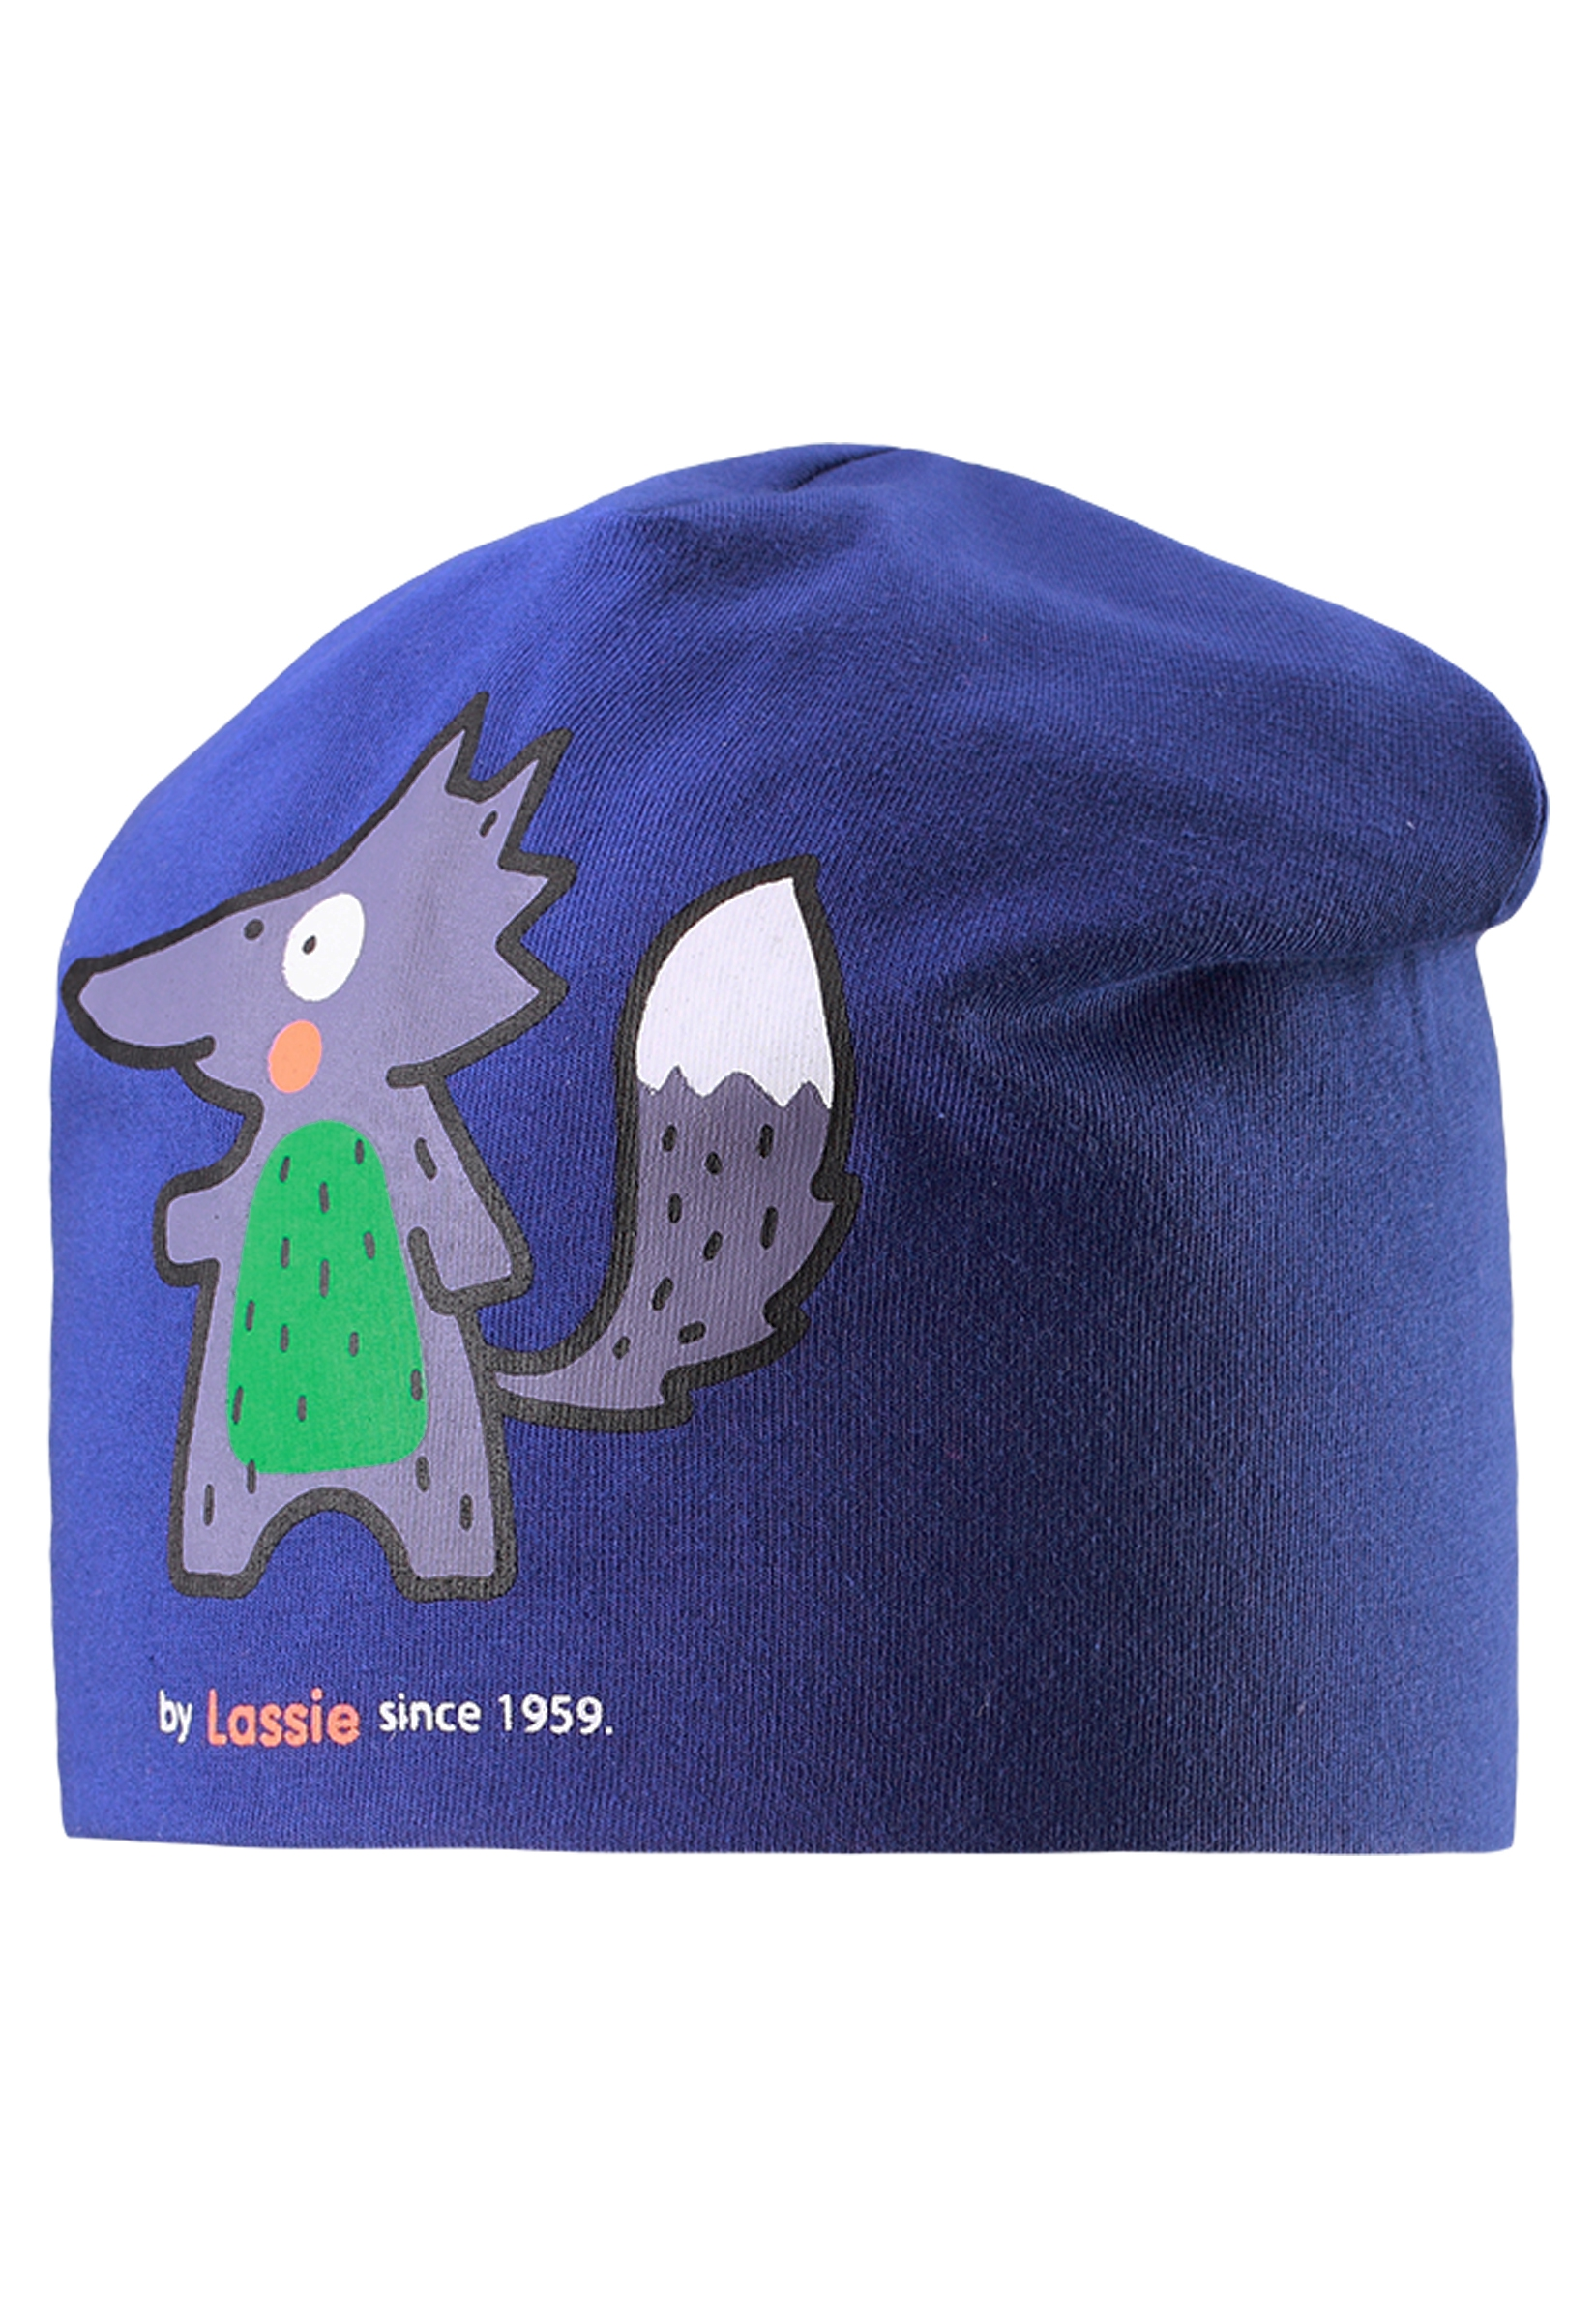 Головные уборы Lassie by Reima Шапка для мальчика Lassie by Reima, синий lassie by reima шапка для девочки lassie by reima